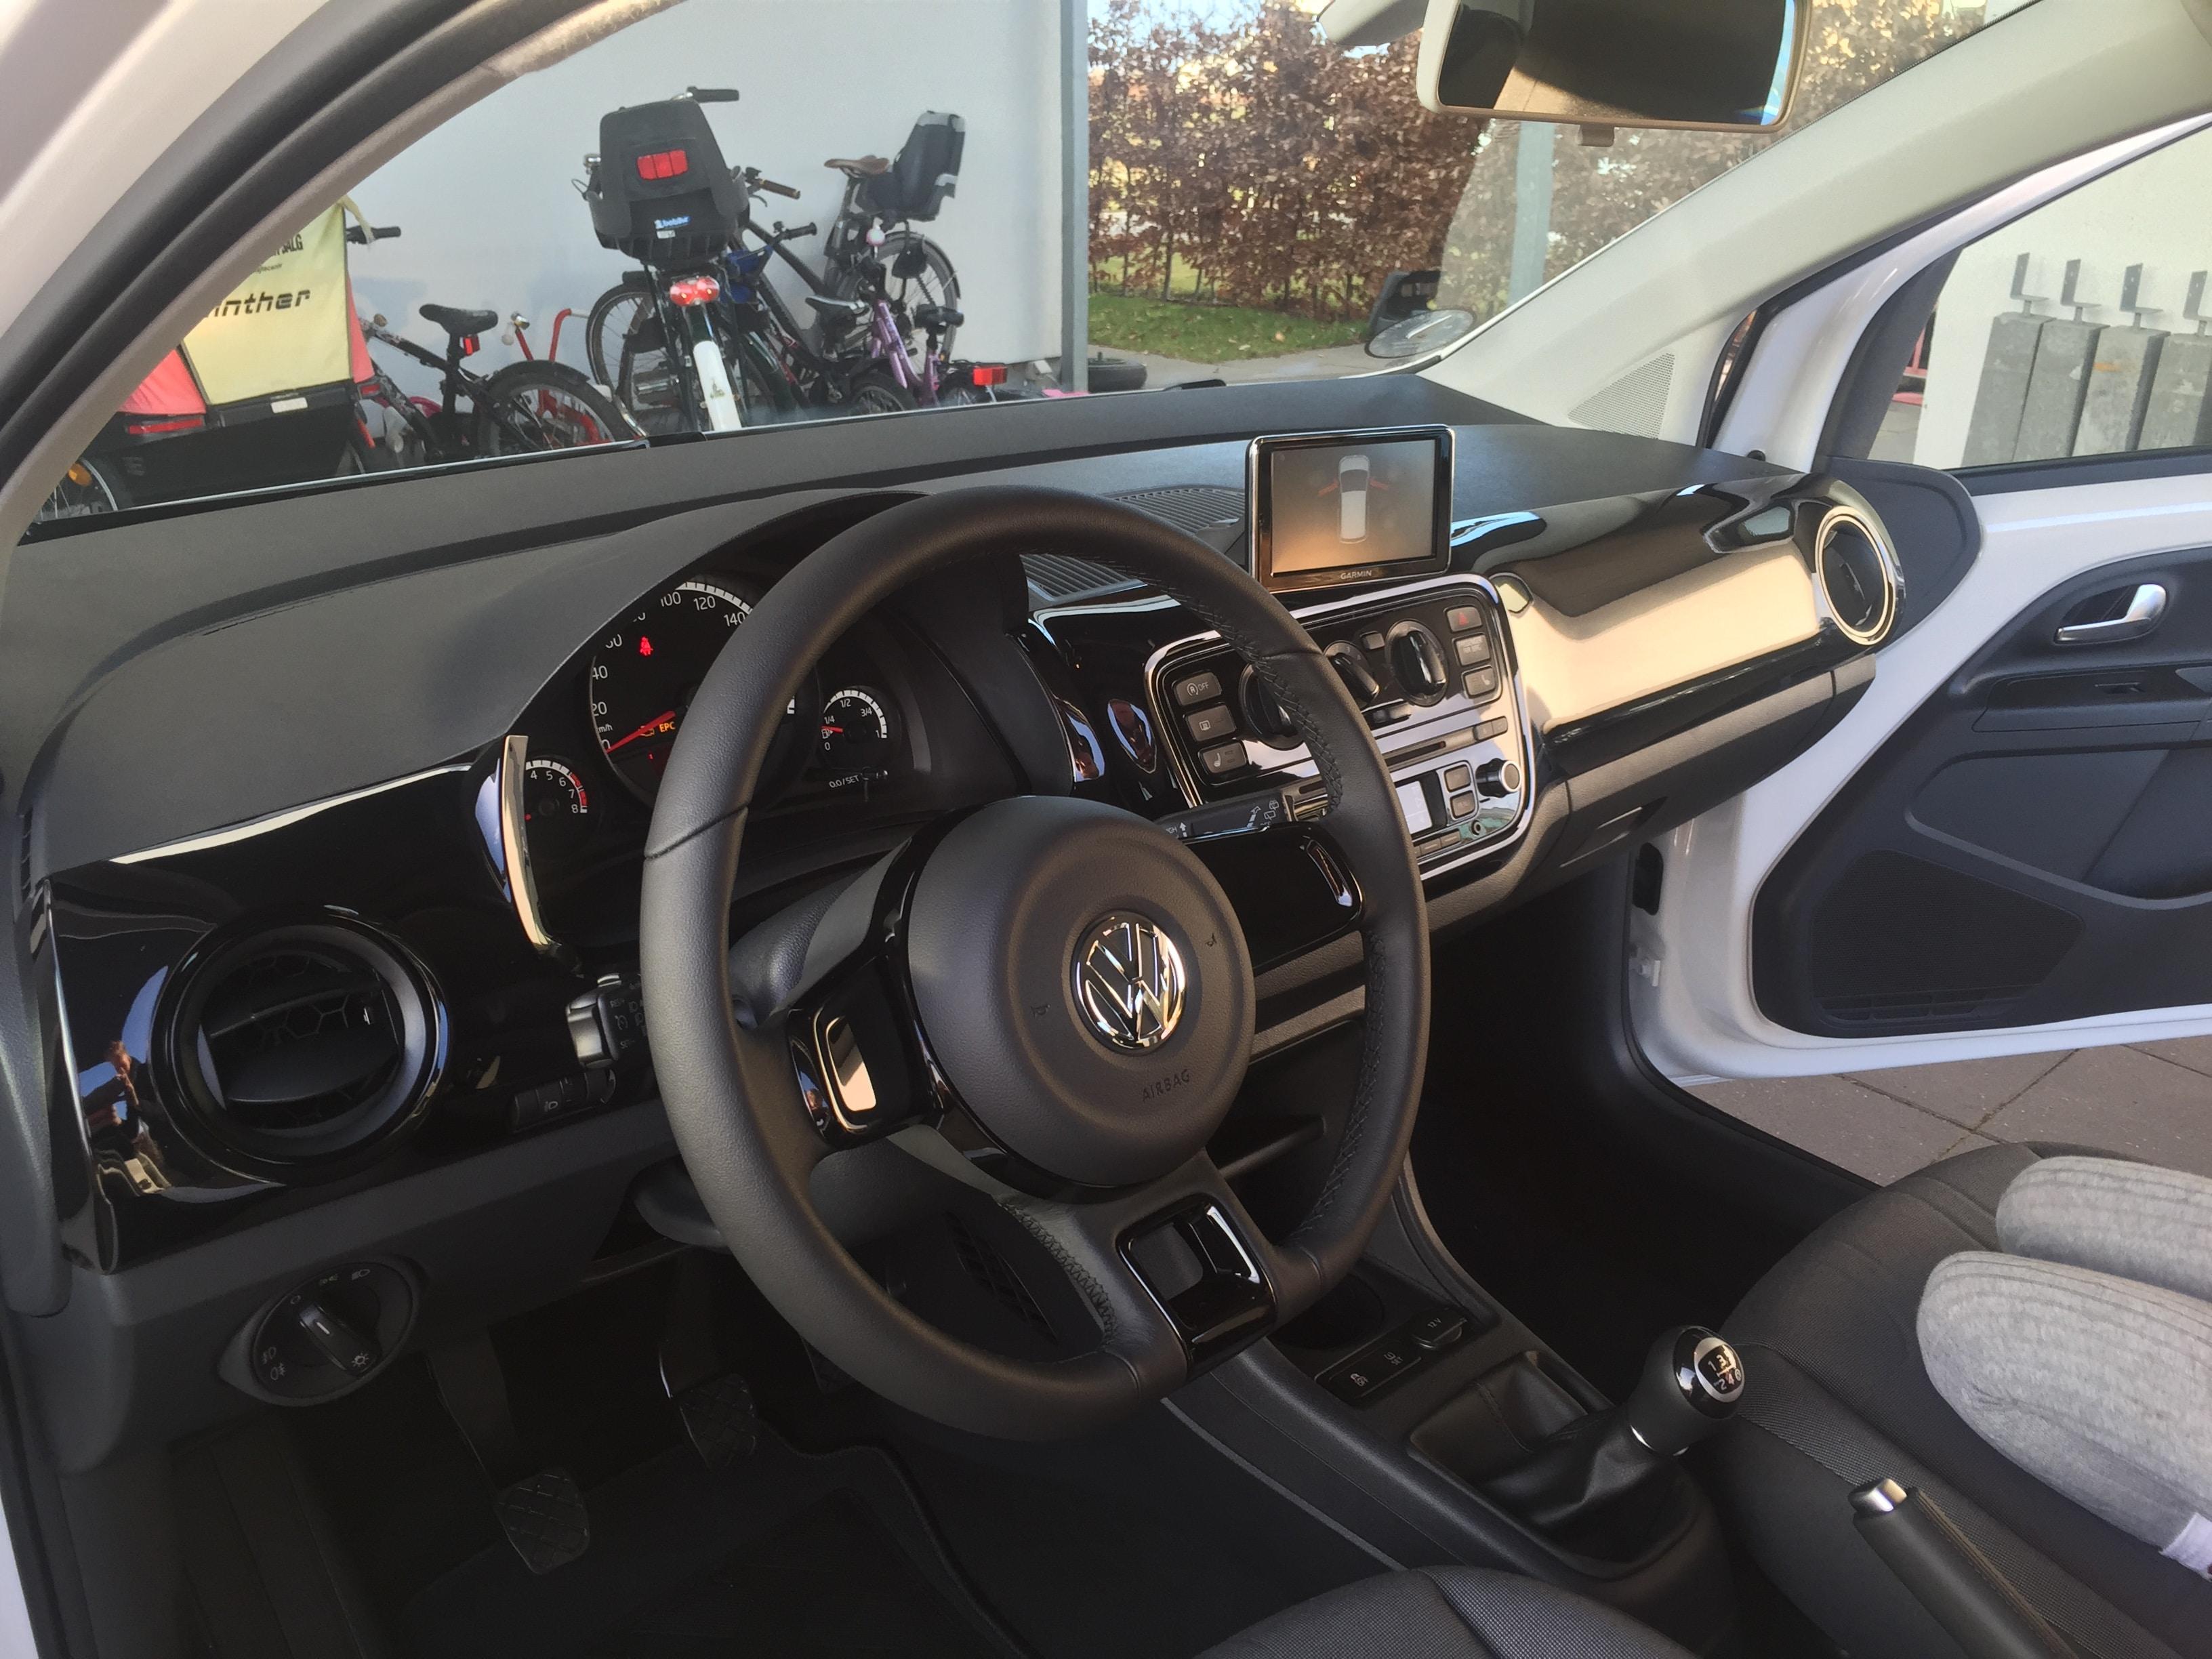 Test: Seat Mii/Vw Up/Skoda Citigo vs. Hyundai i10 som pendlerbil på motorvej | Livets små ting